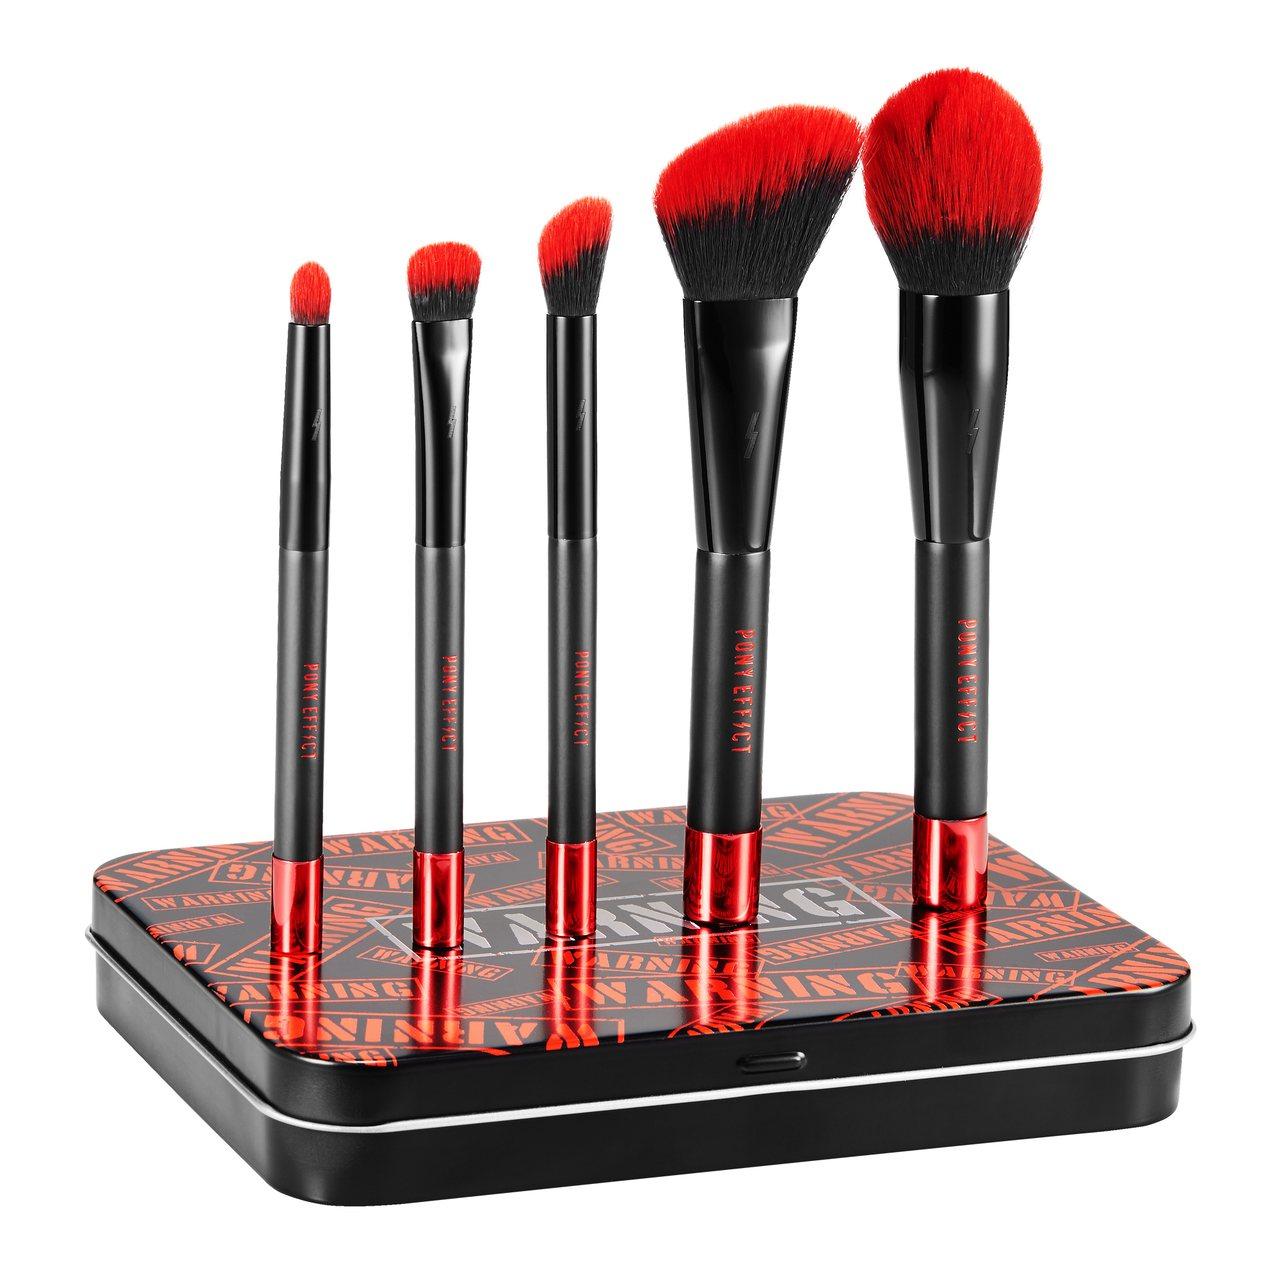 PONY EFFECT紅色警戒磁力刷具組,售價990元。圖/PONY EFFEC...